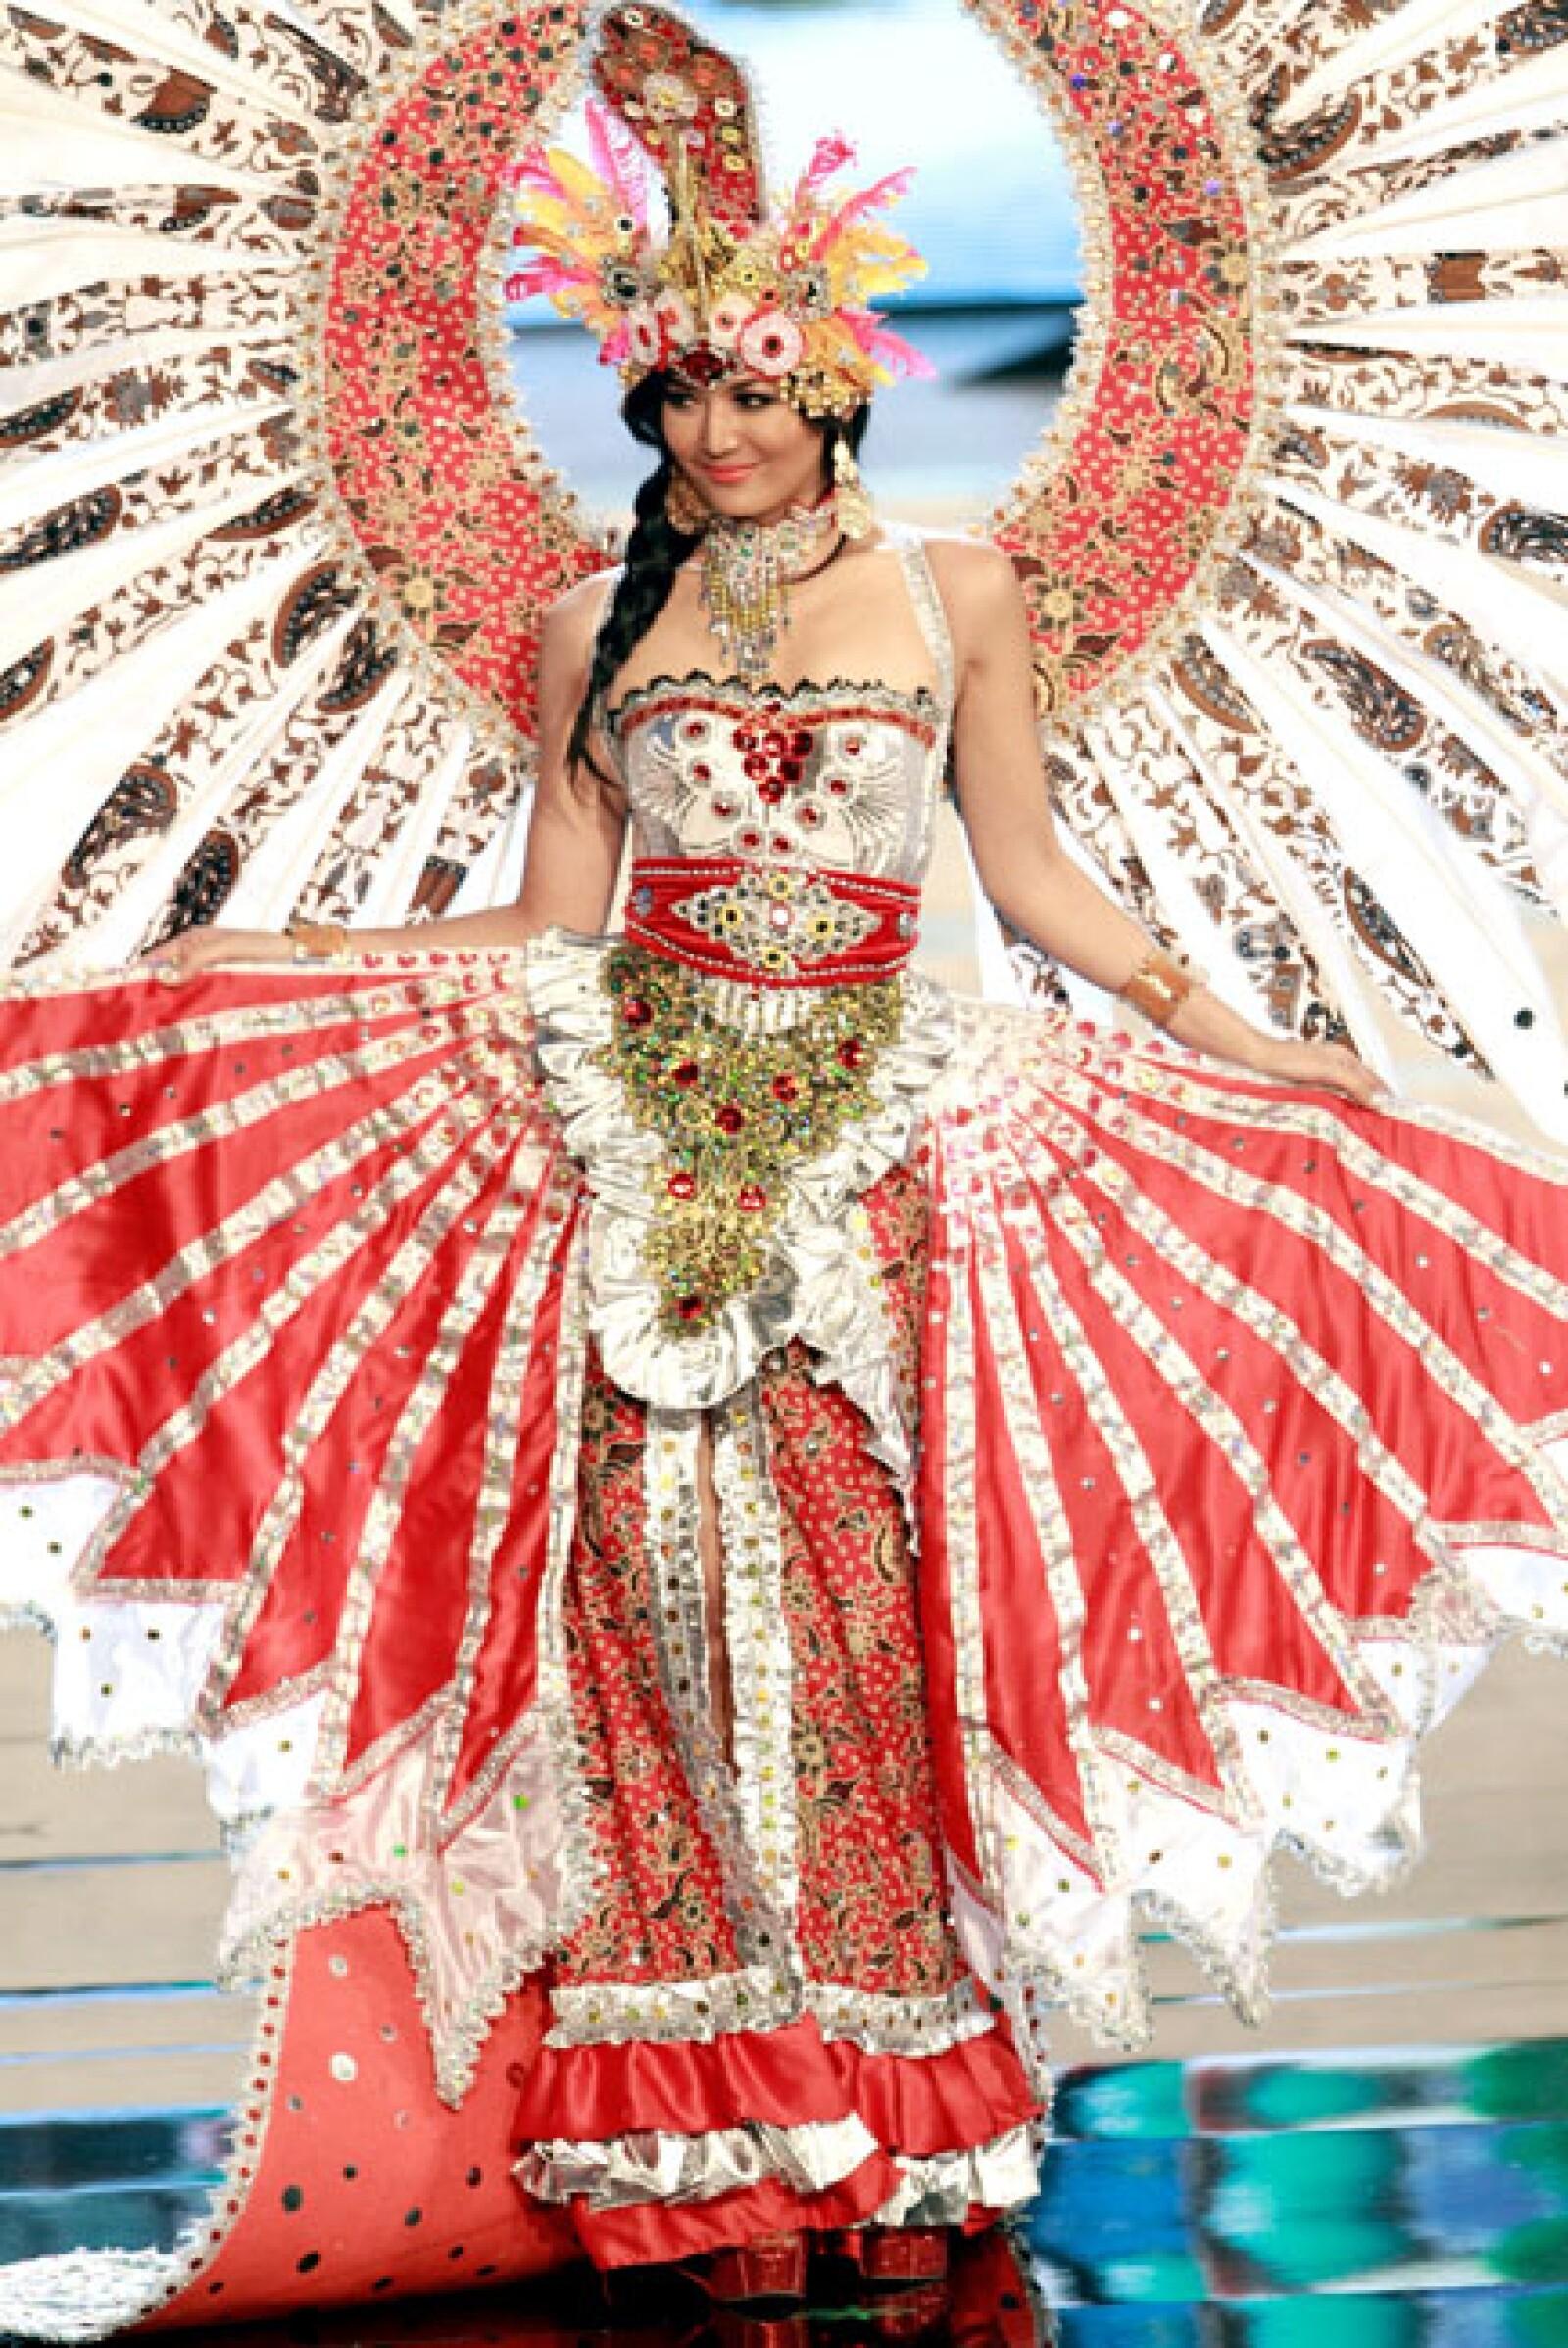 Miss Indonesia, Maria Selena